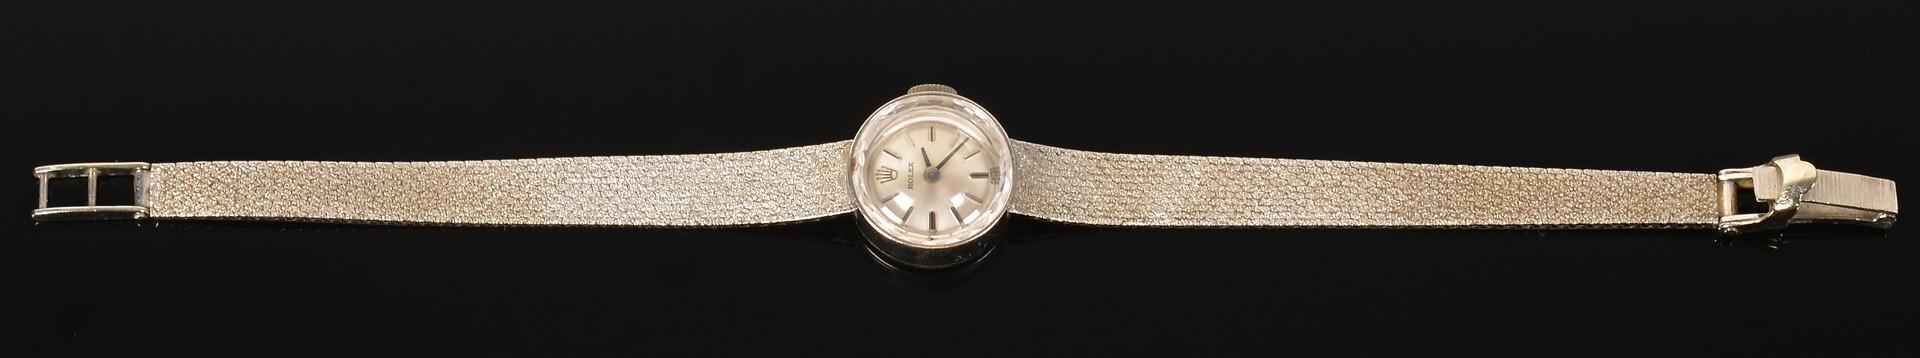 Lot 388: 14K Vintage Ladies Rolex Dress Watch